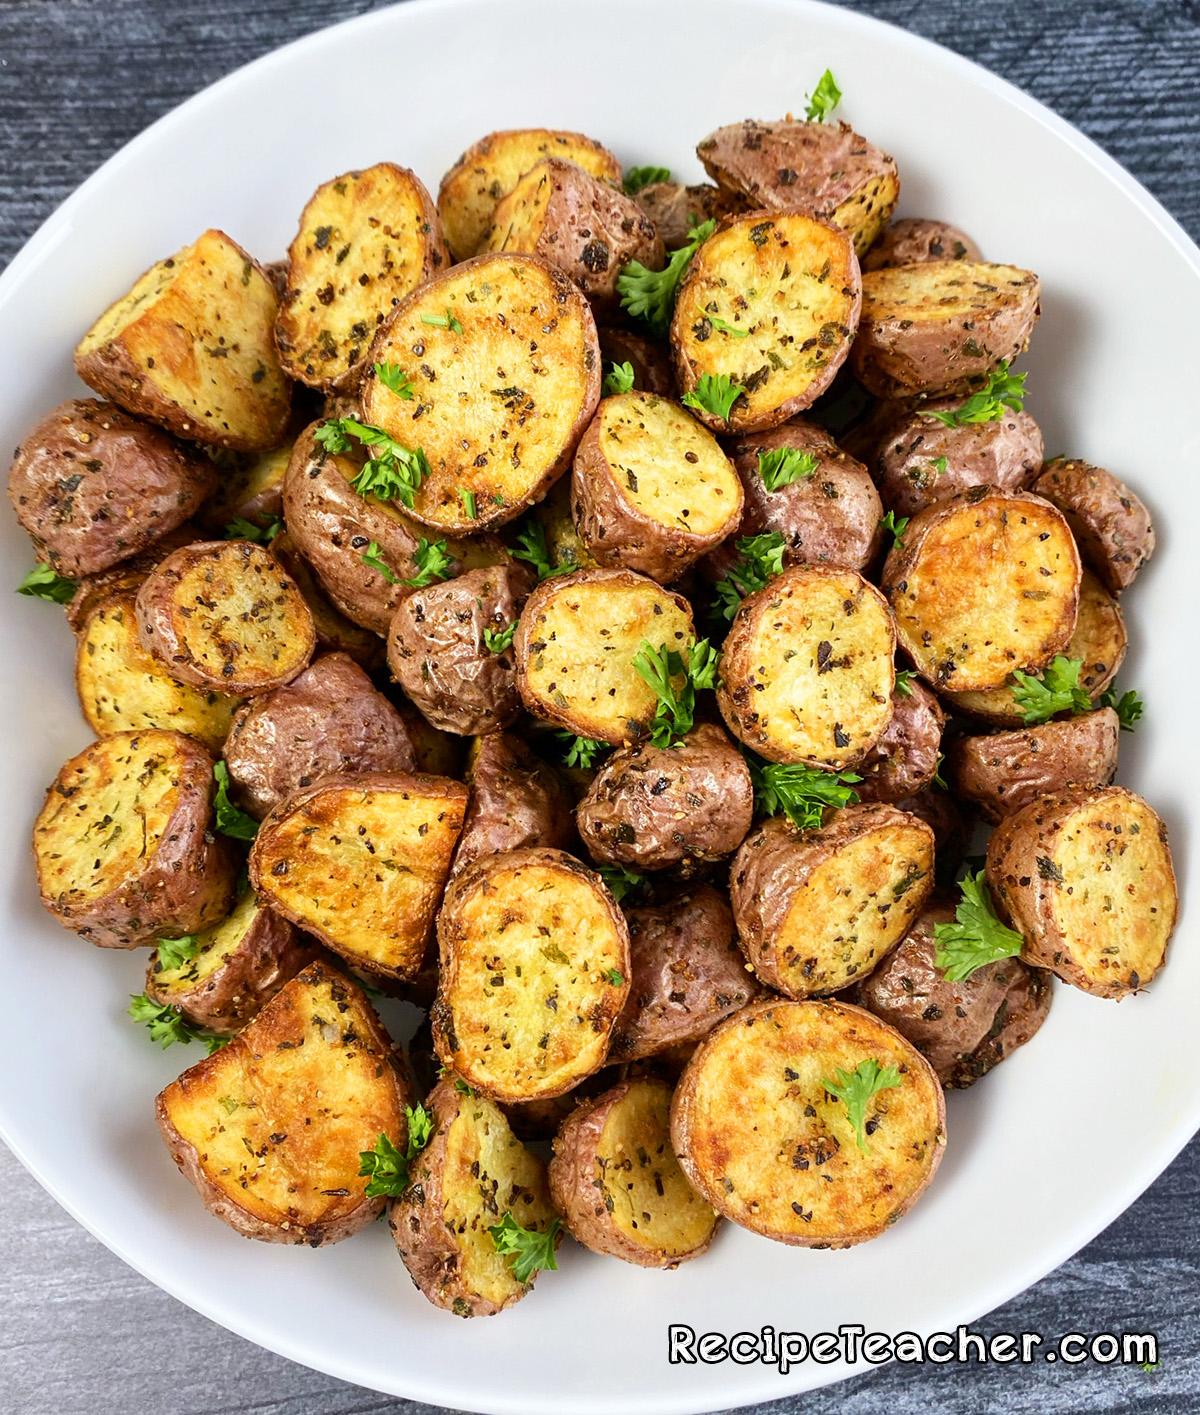 Air fryer roasted potatoes recipe